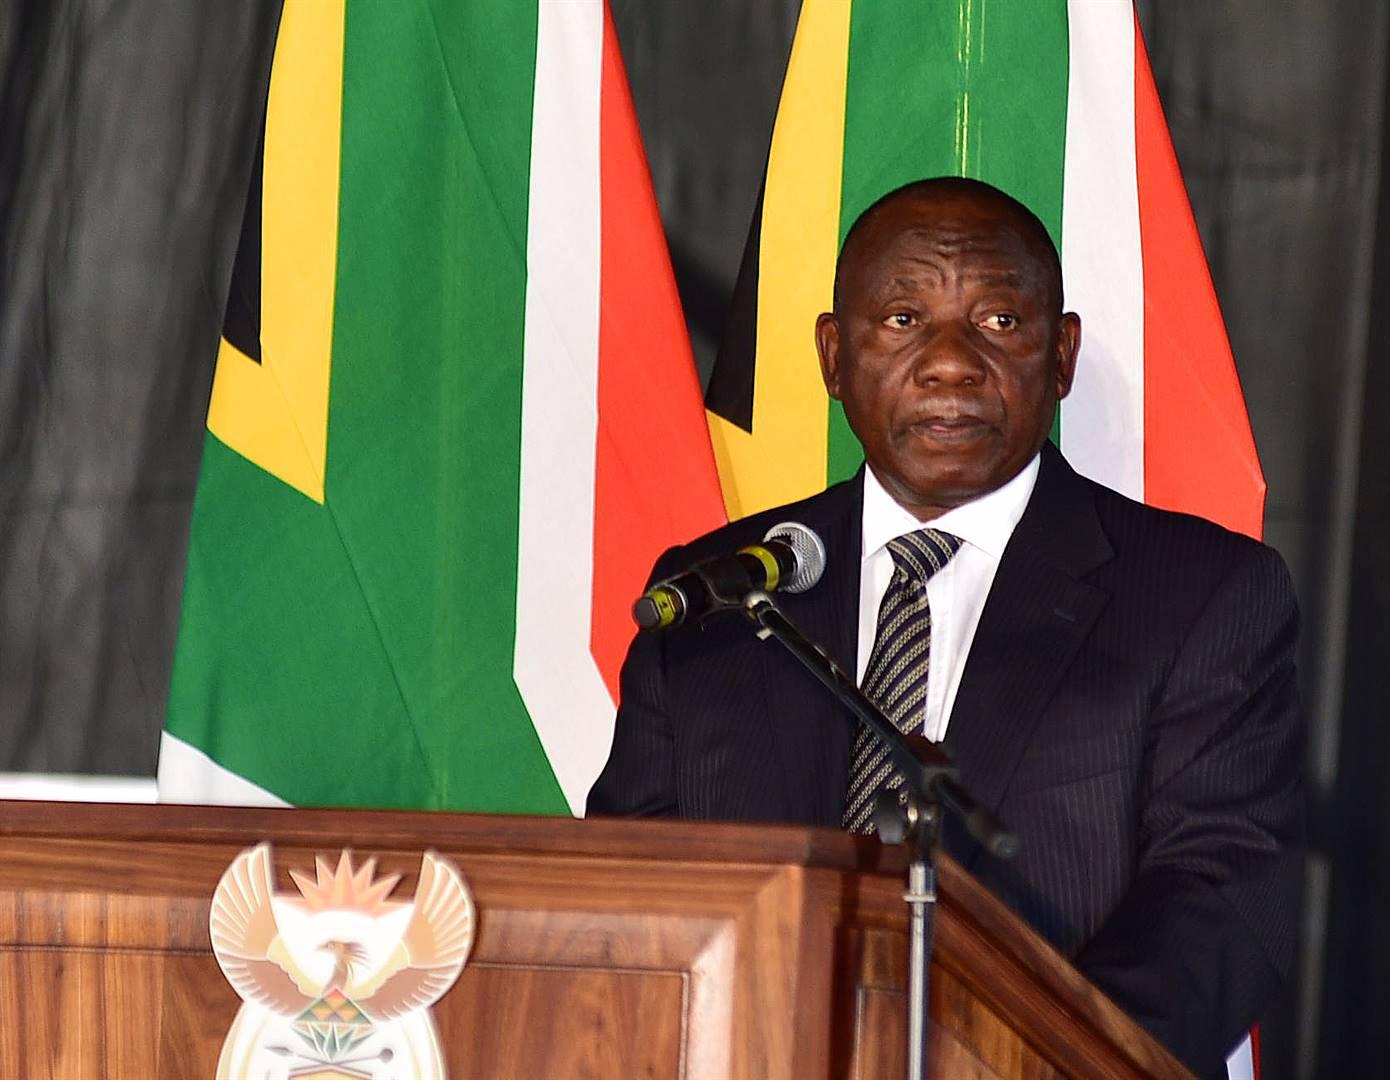 Pres. Cyril Ramaphosa Foto: Daily Sun